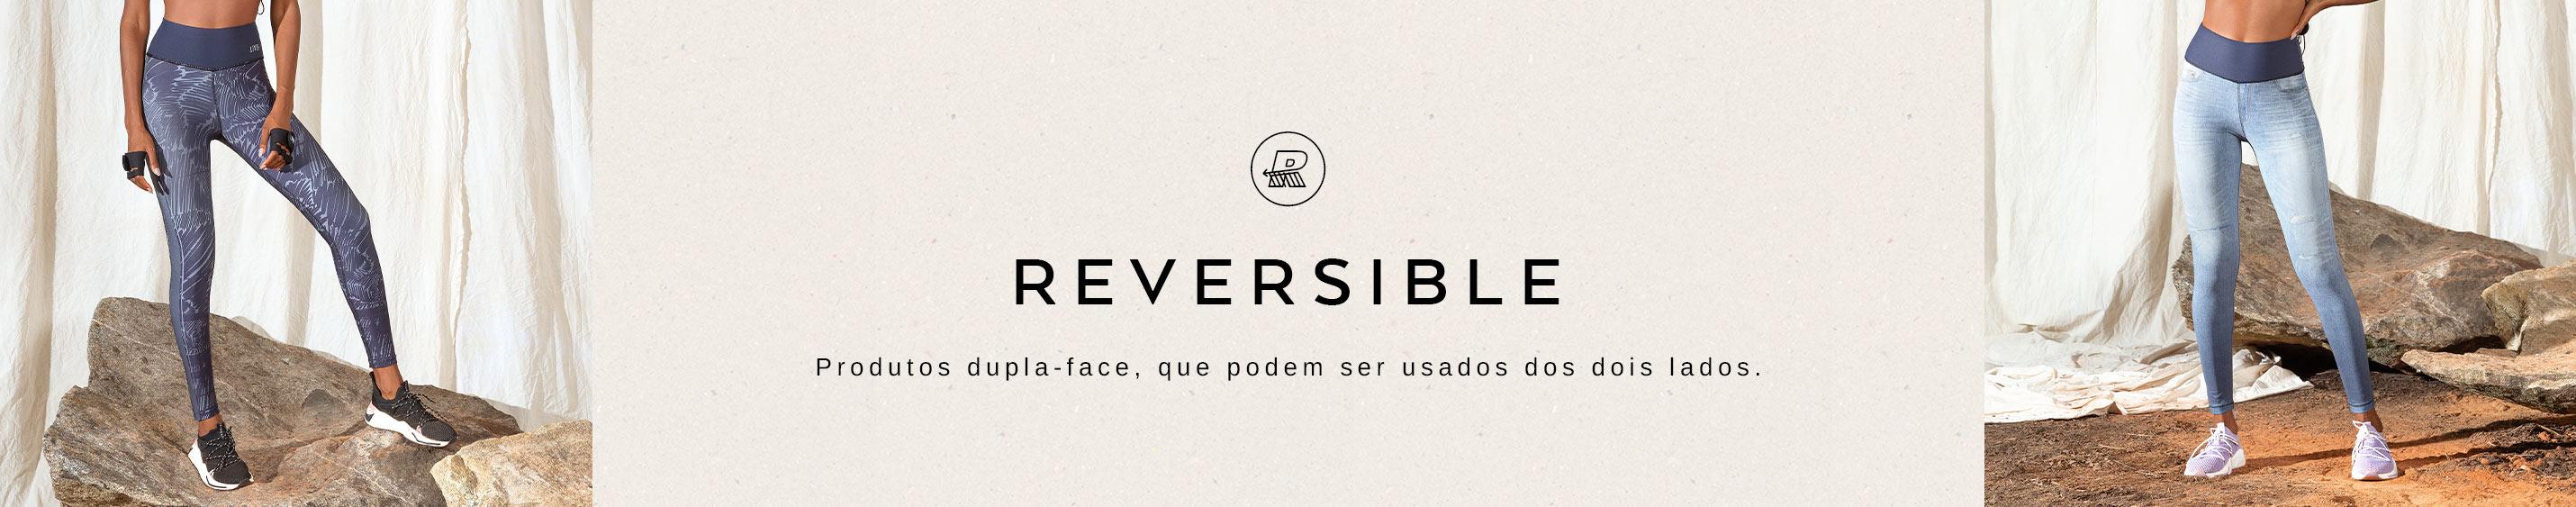 banner_reversible